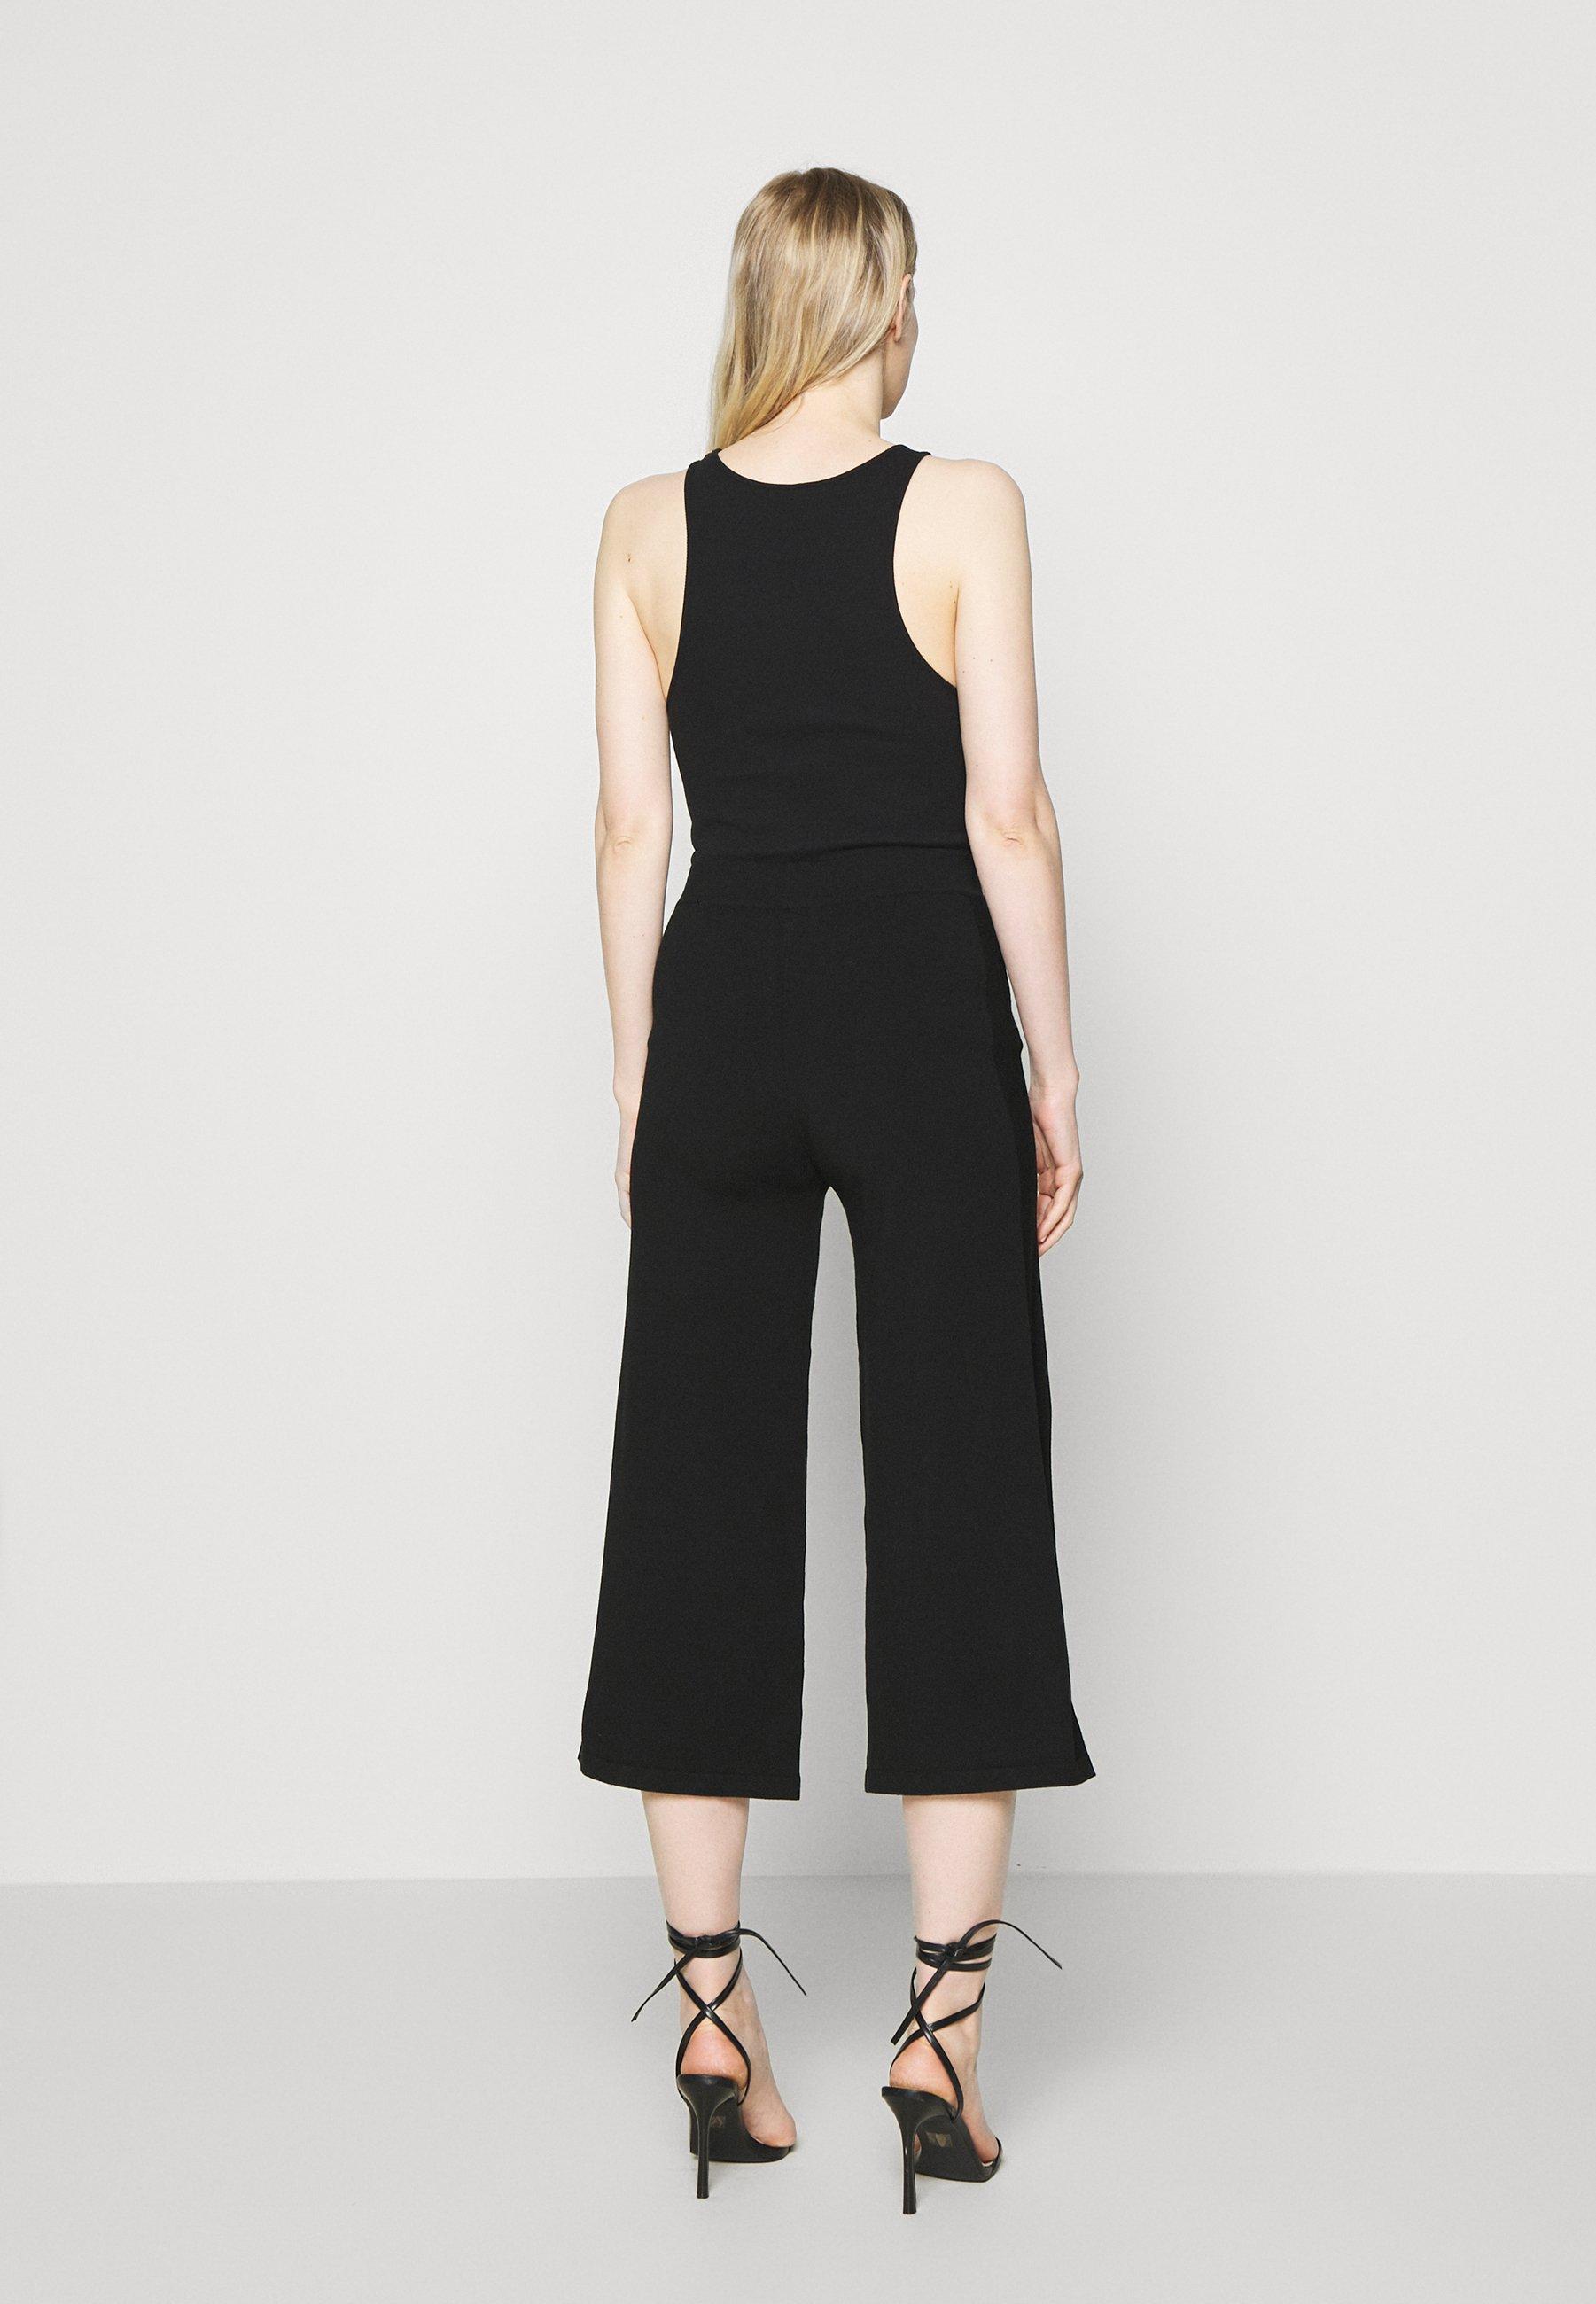 Marc O'Polo PURE HEAVY PANT - Pantalon classique - pure black - Pantalons & Leggings Femme 89Z1H